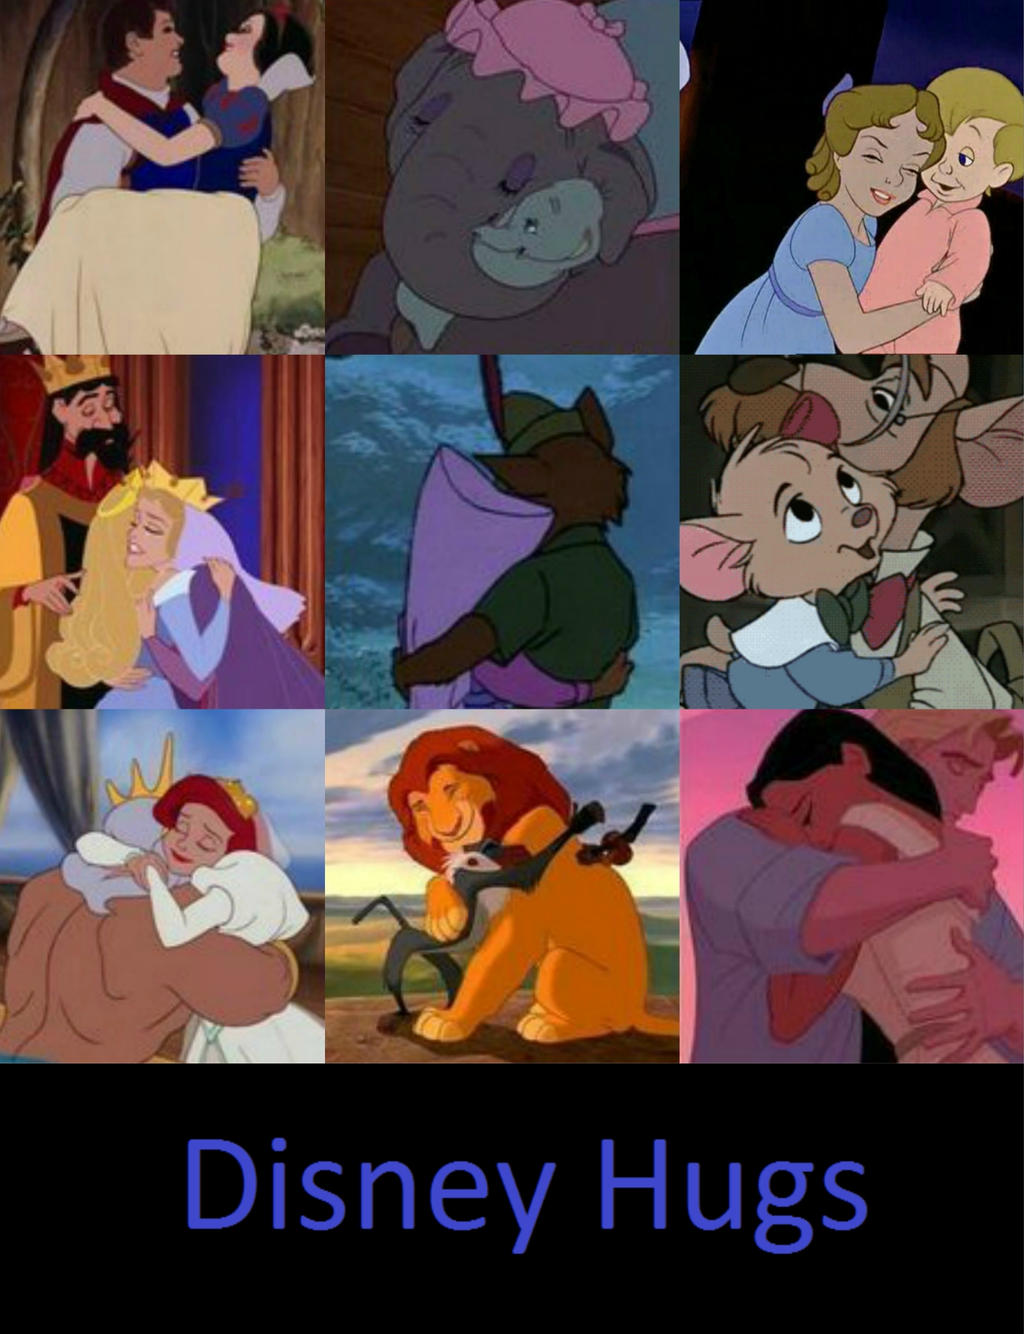 Disney sleeping beauty and prince